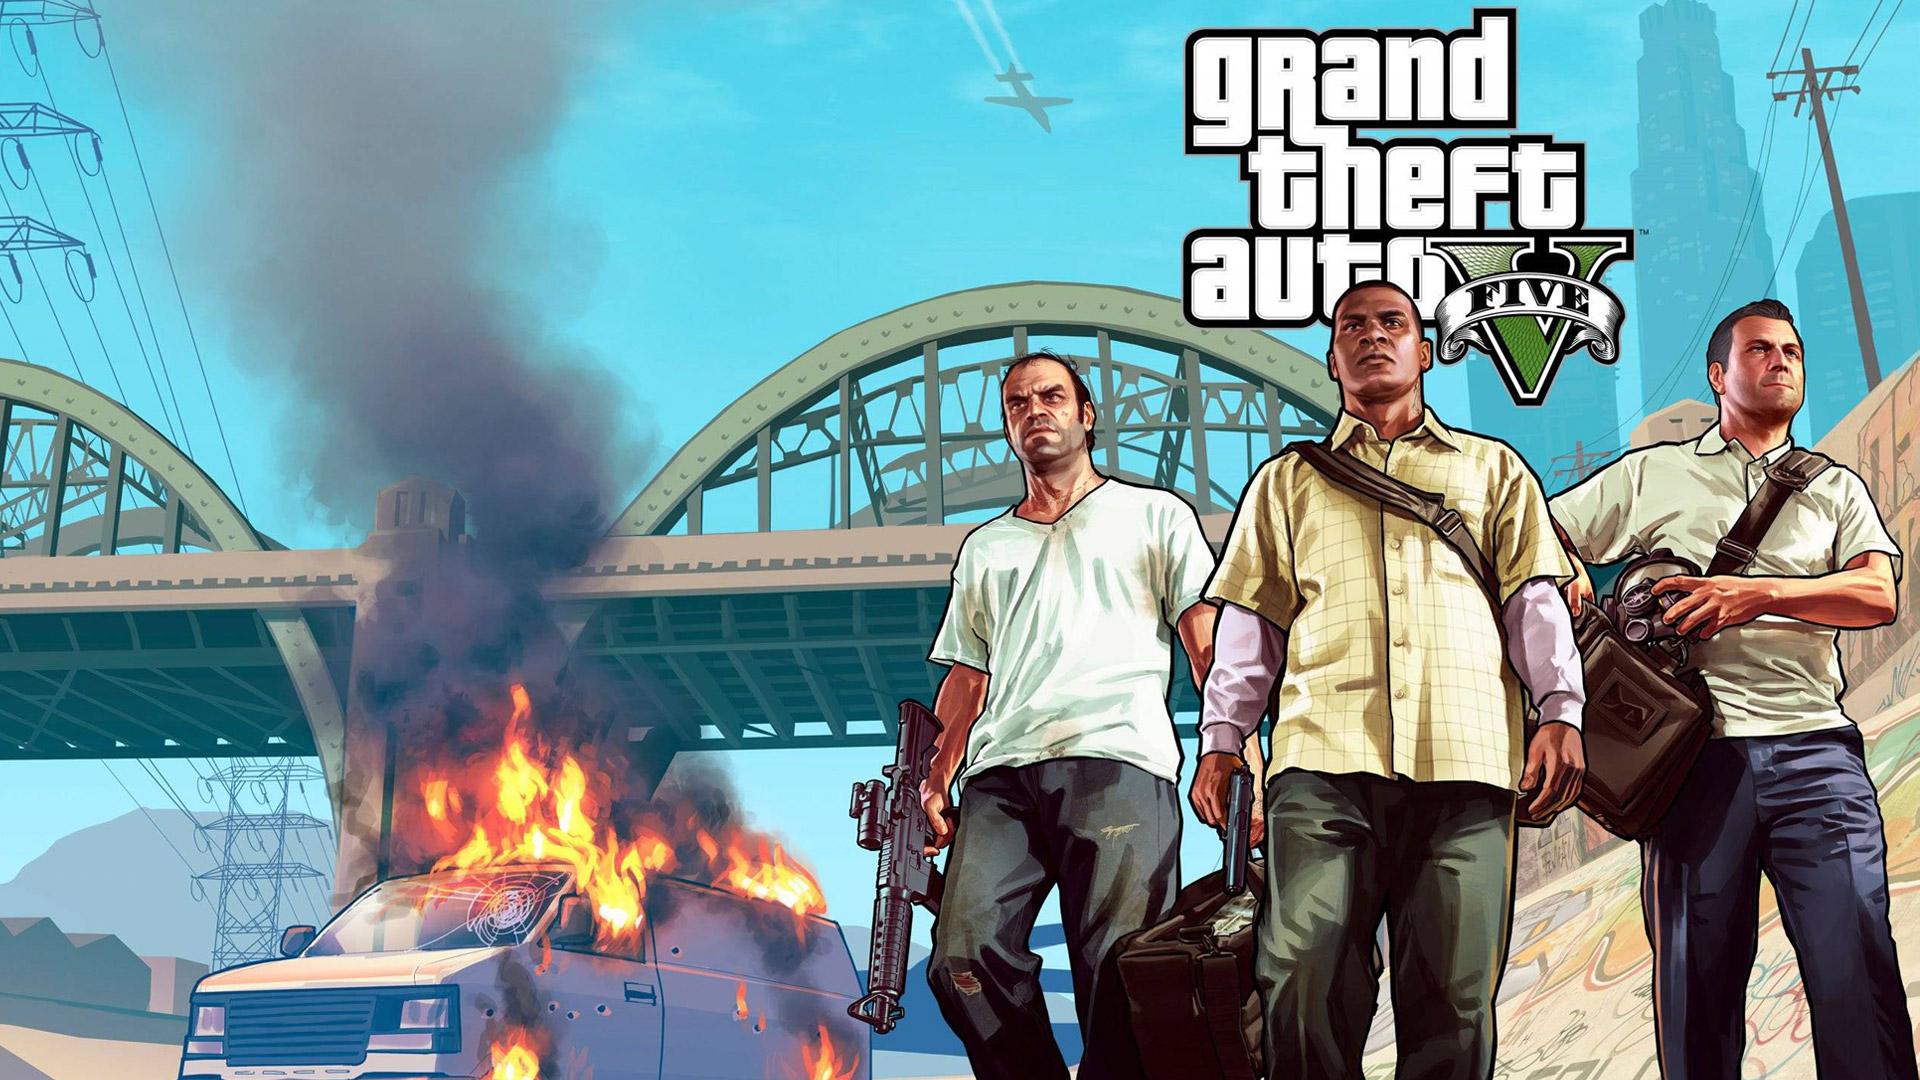 Grand Theft Auto 5 wallpaper 24